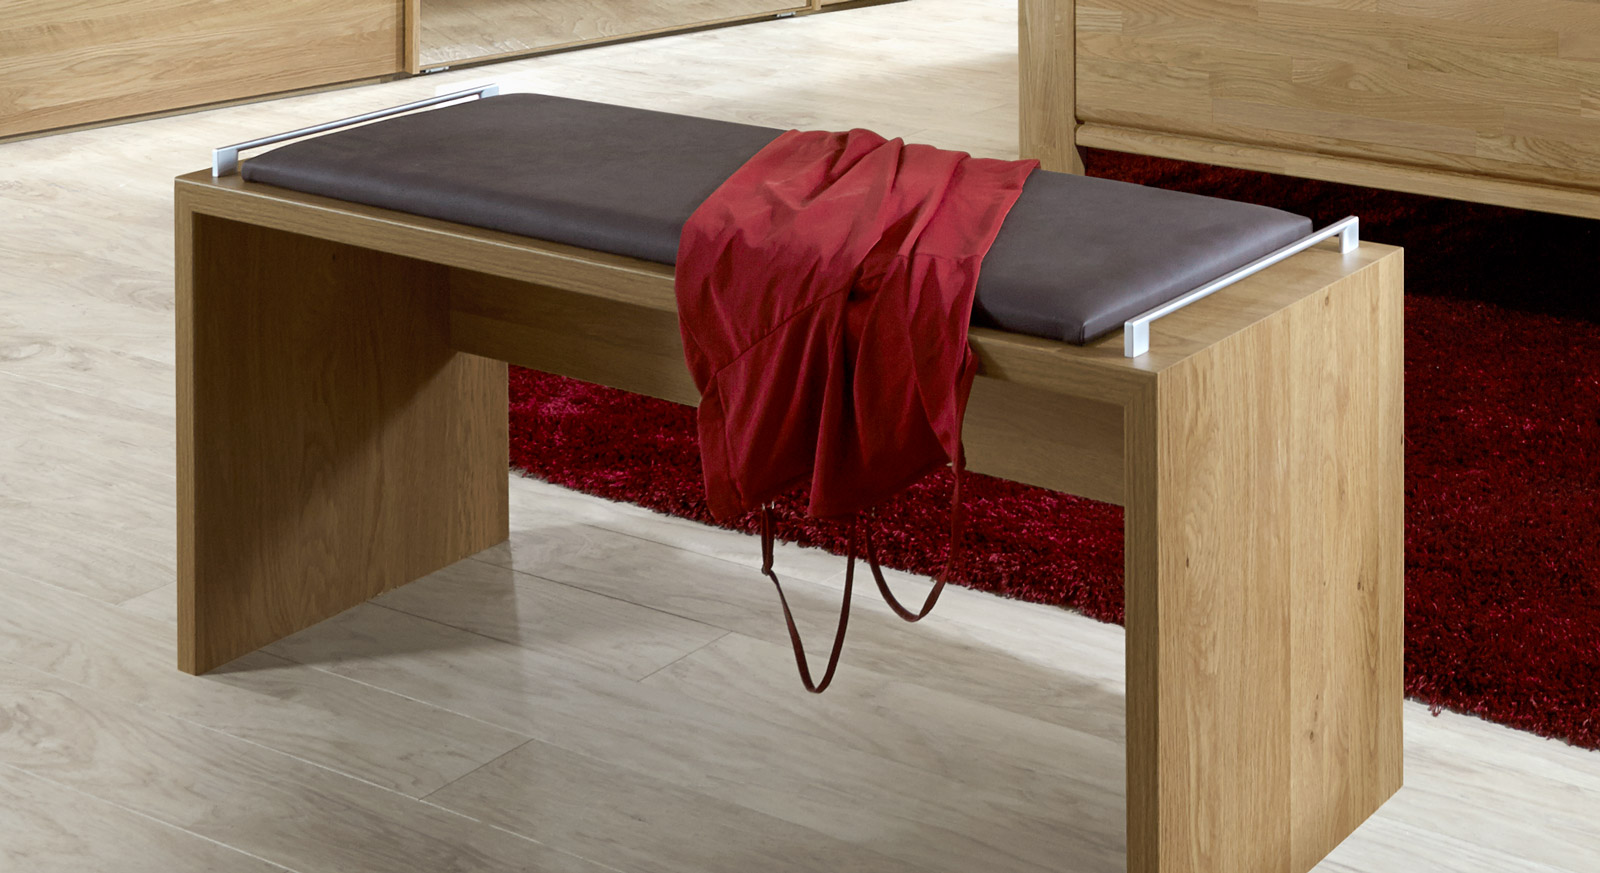 Bettbank Quebo inklusive einem bequemen Kunstlederpolster